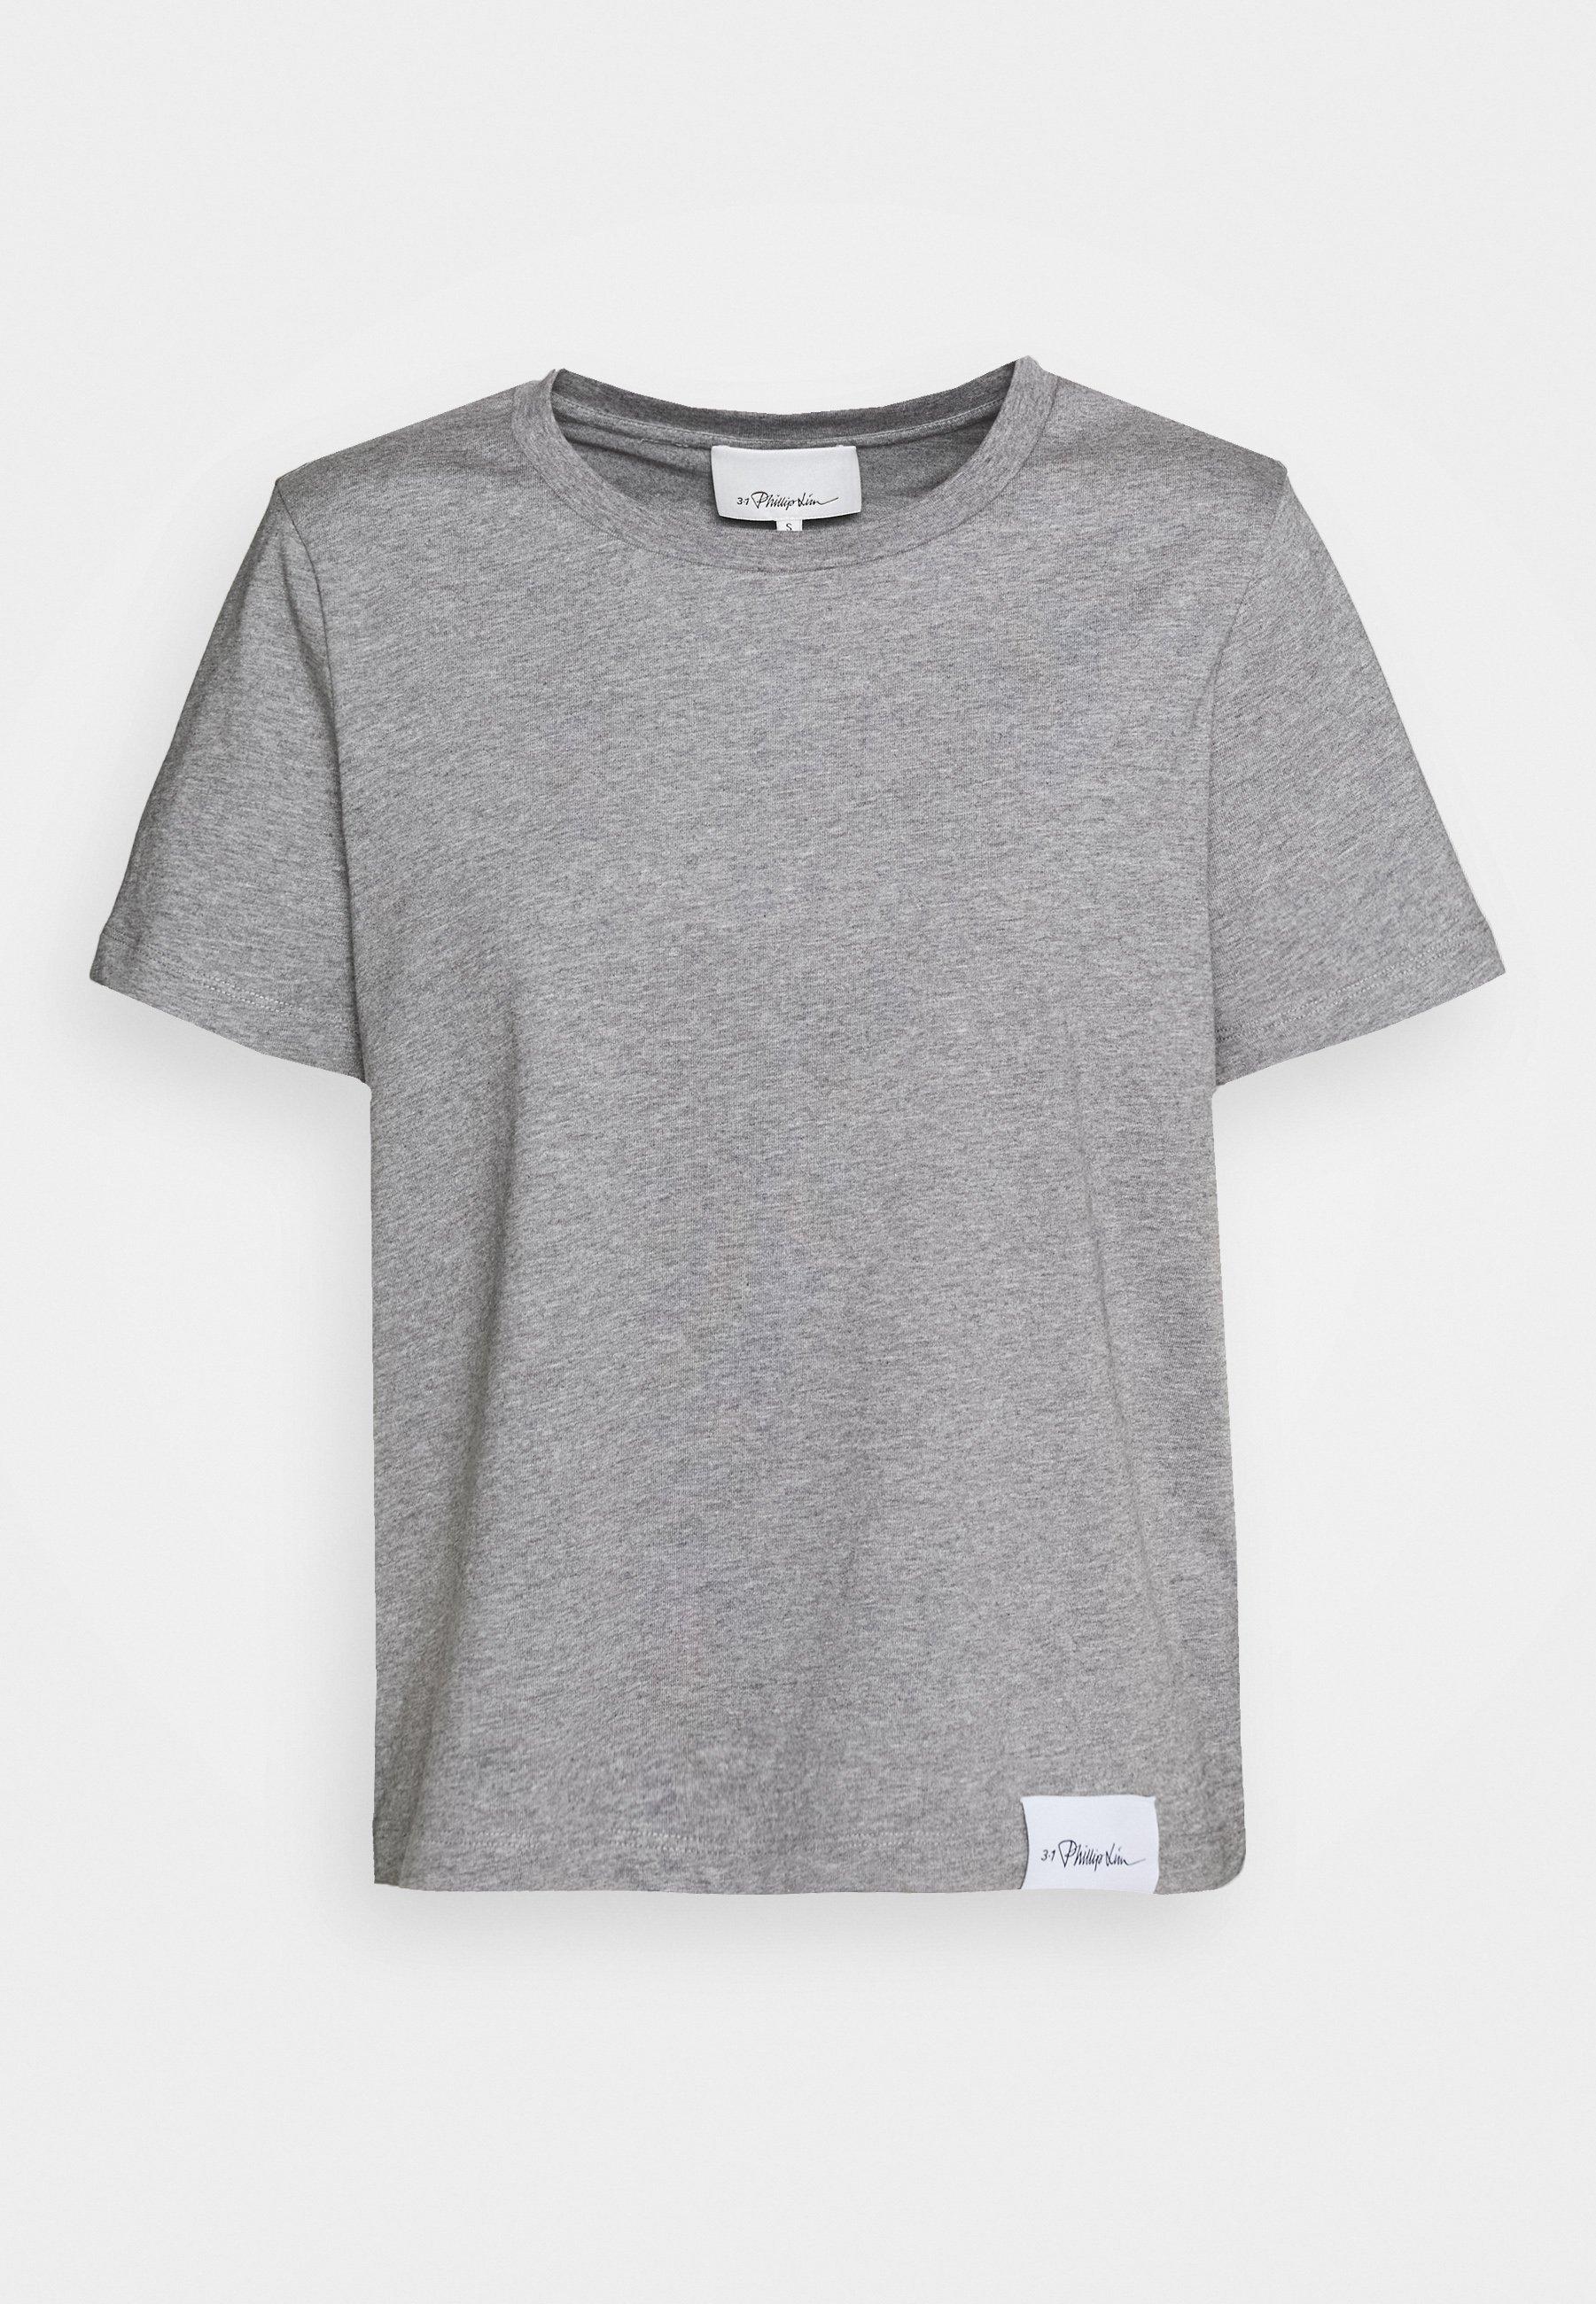 3.1 Phillip Lim LOGO CREW - T-shirt basic - grey melange 8tv8d15i